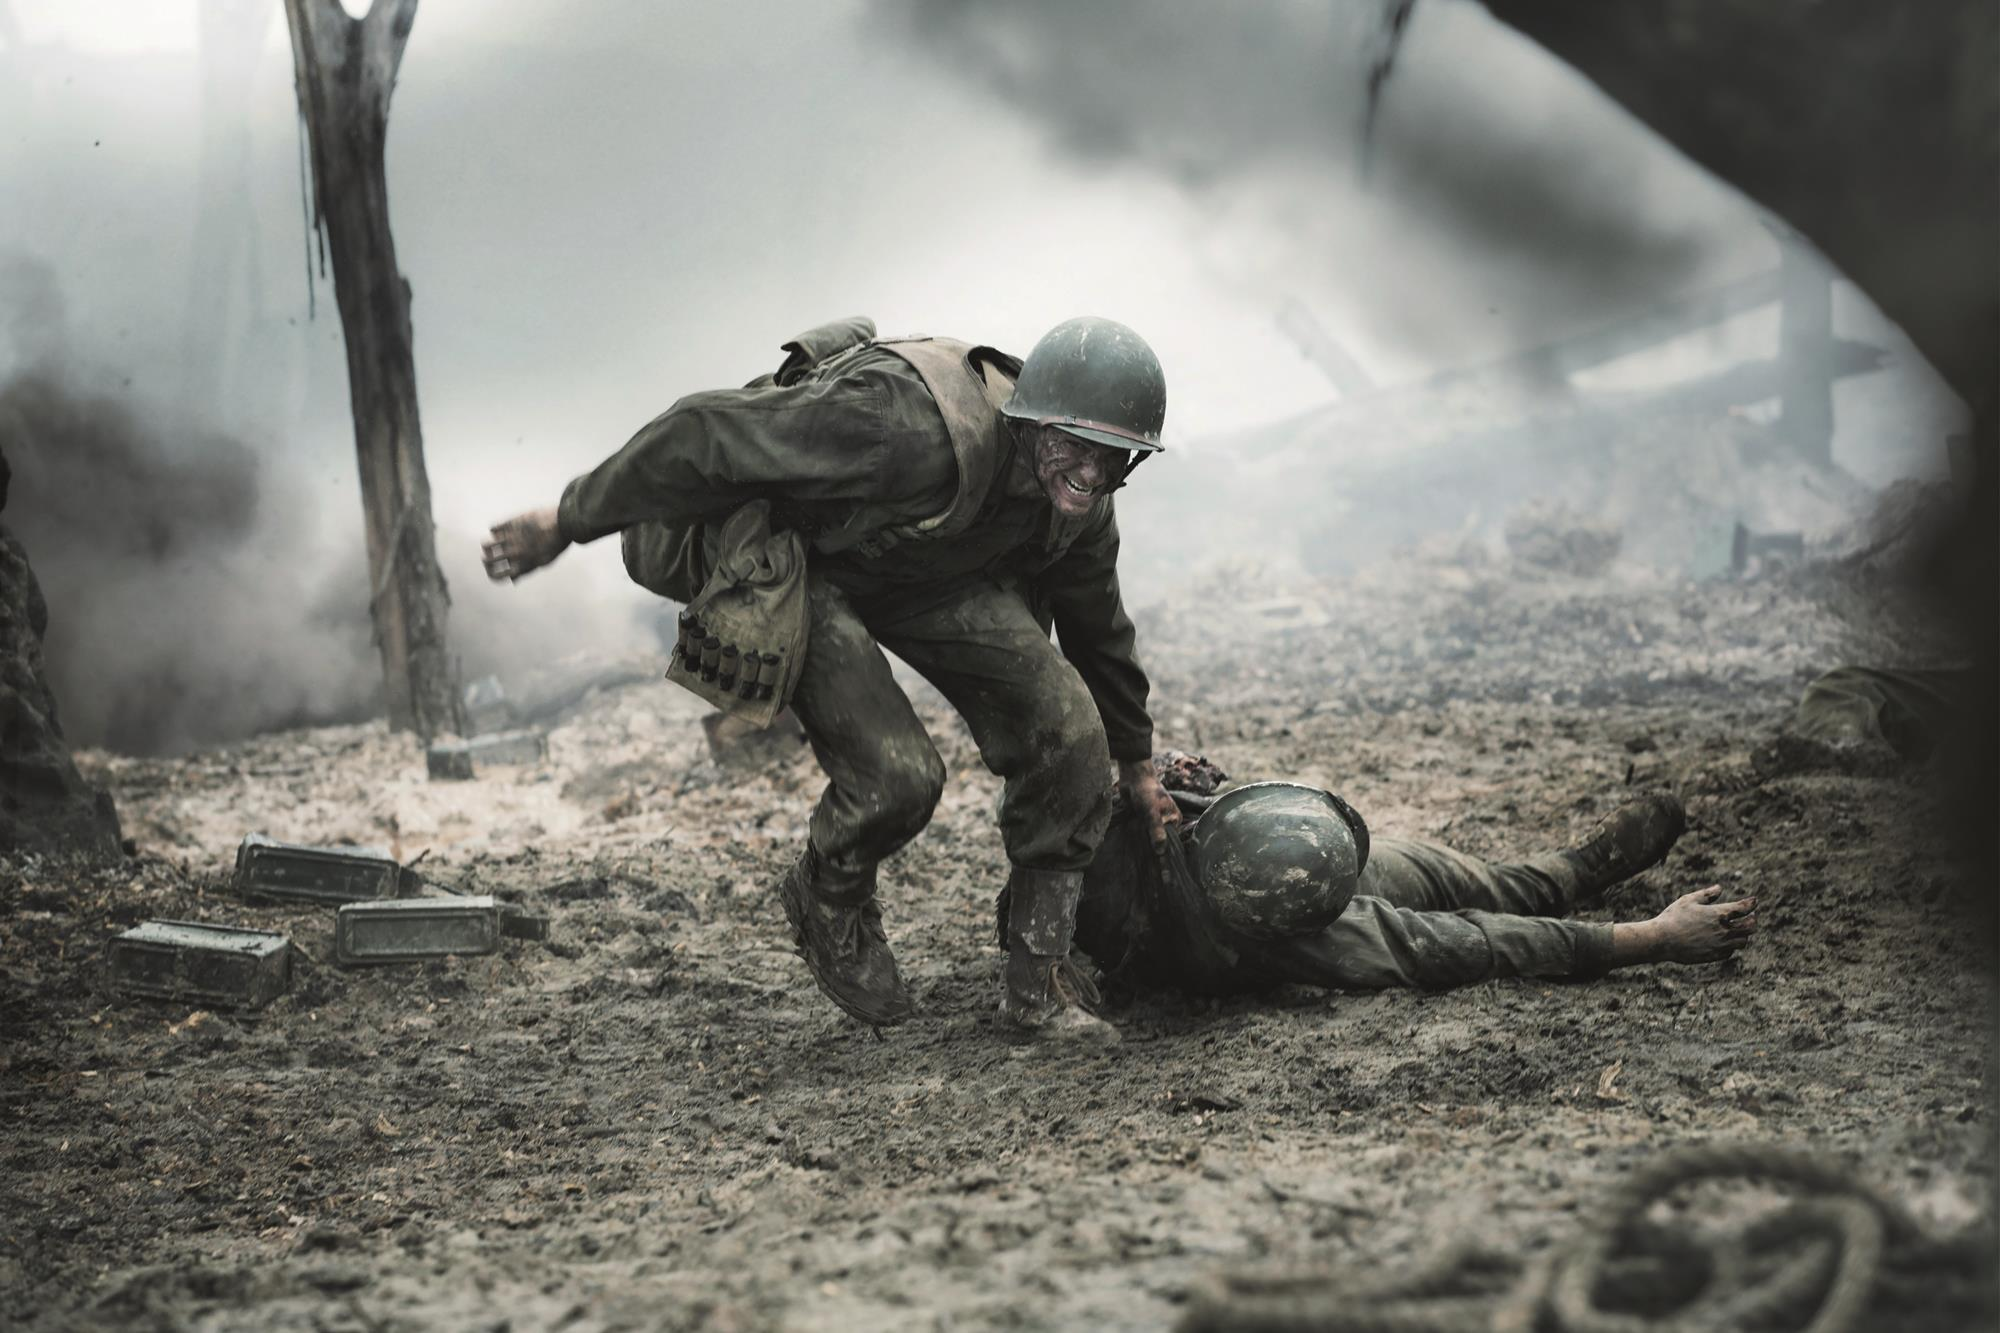 Robert Schenkkan on why 'Hacksaw Ridge' hero is antithesis of Donald Trump | Features | Screen